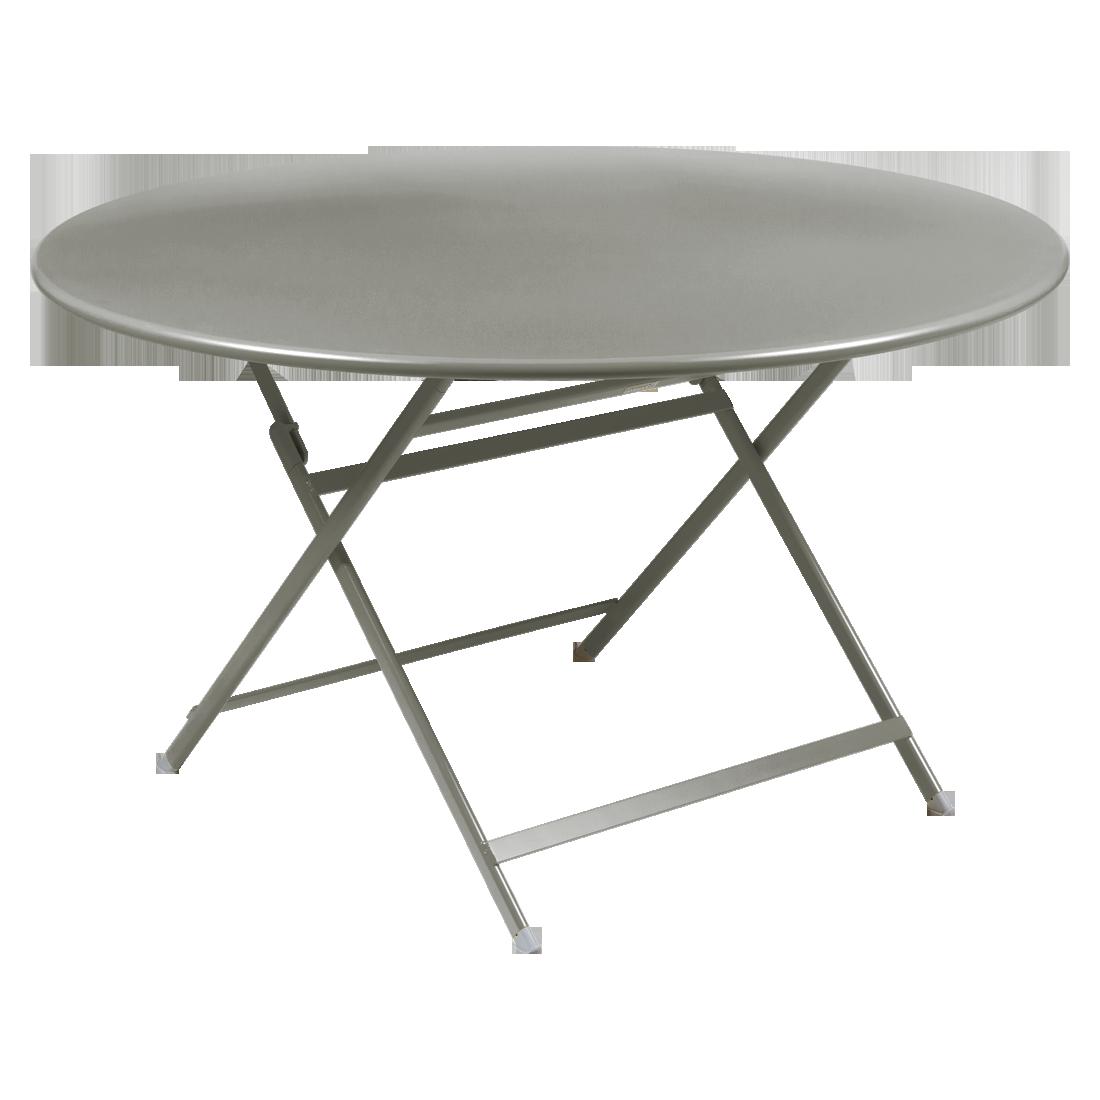 table de jardin pliante, table metal ronde, table metal 7 personnes, table de jardin grise, table metal grise